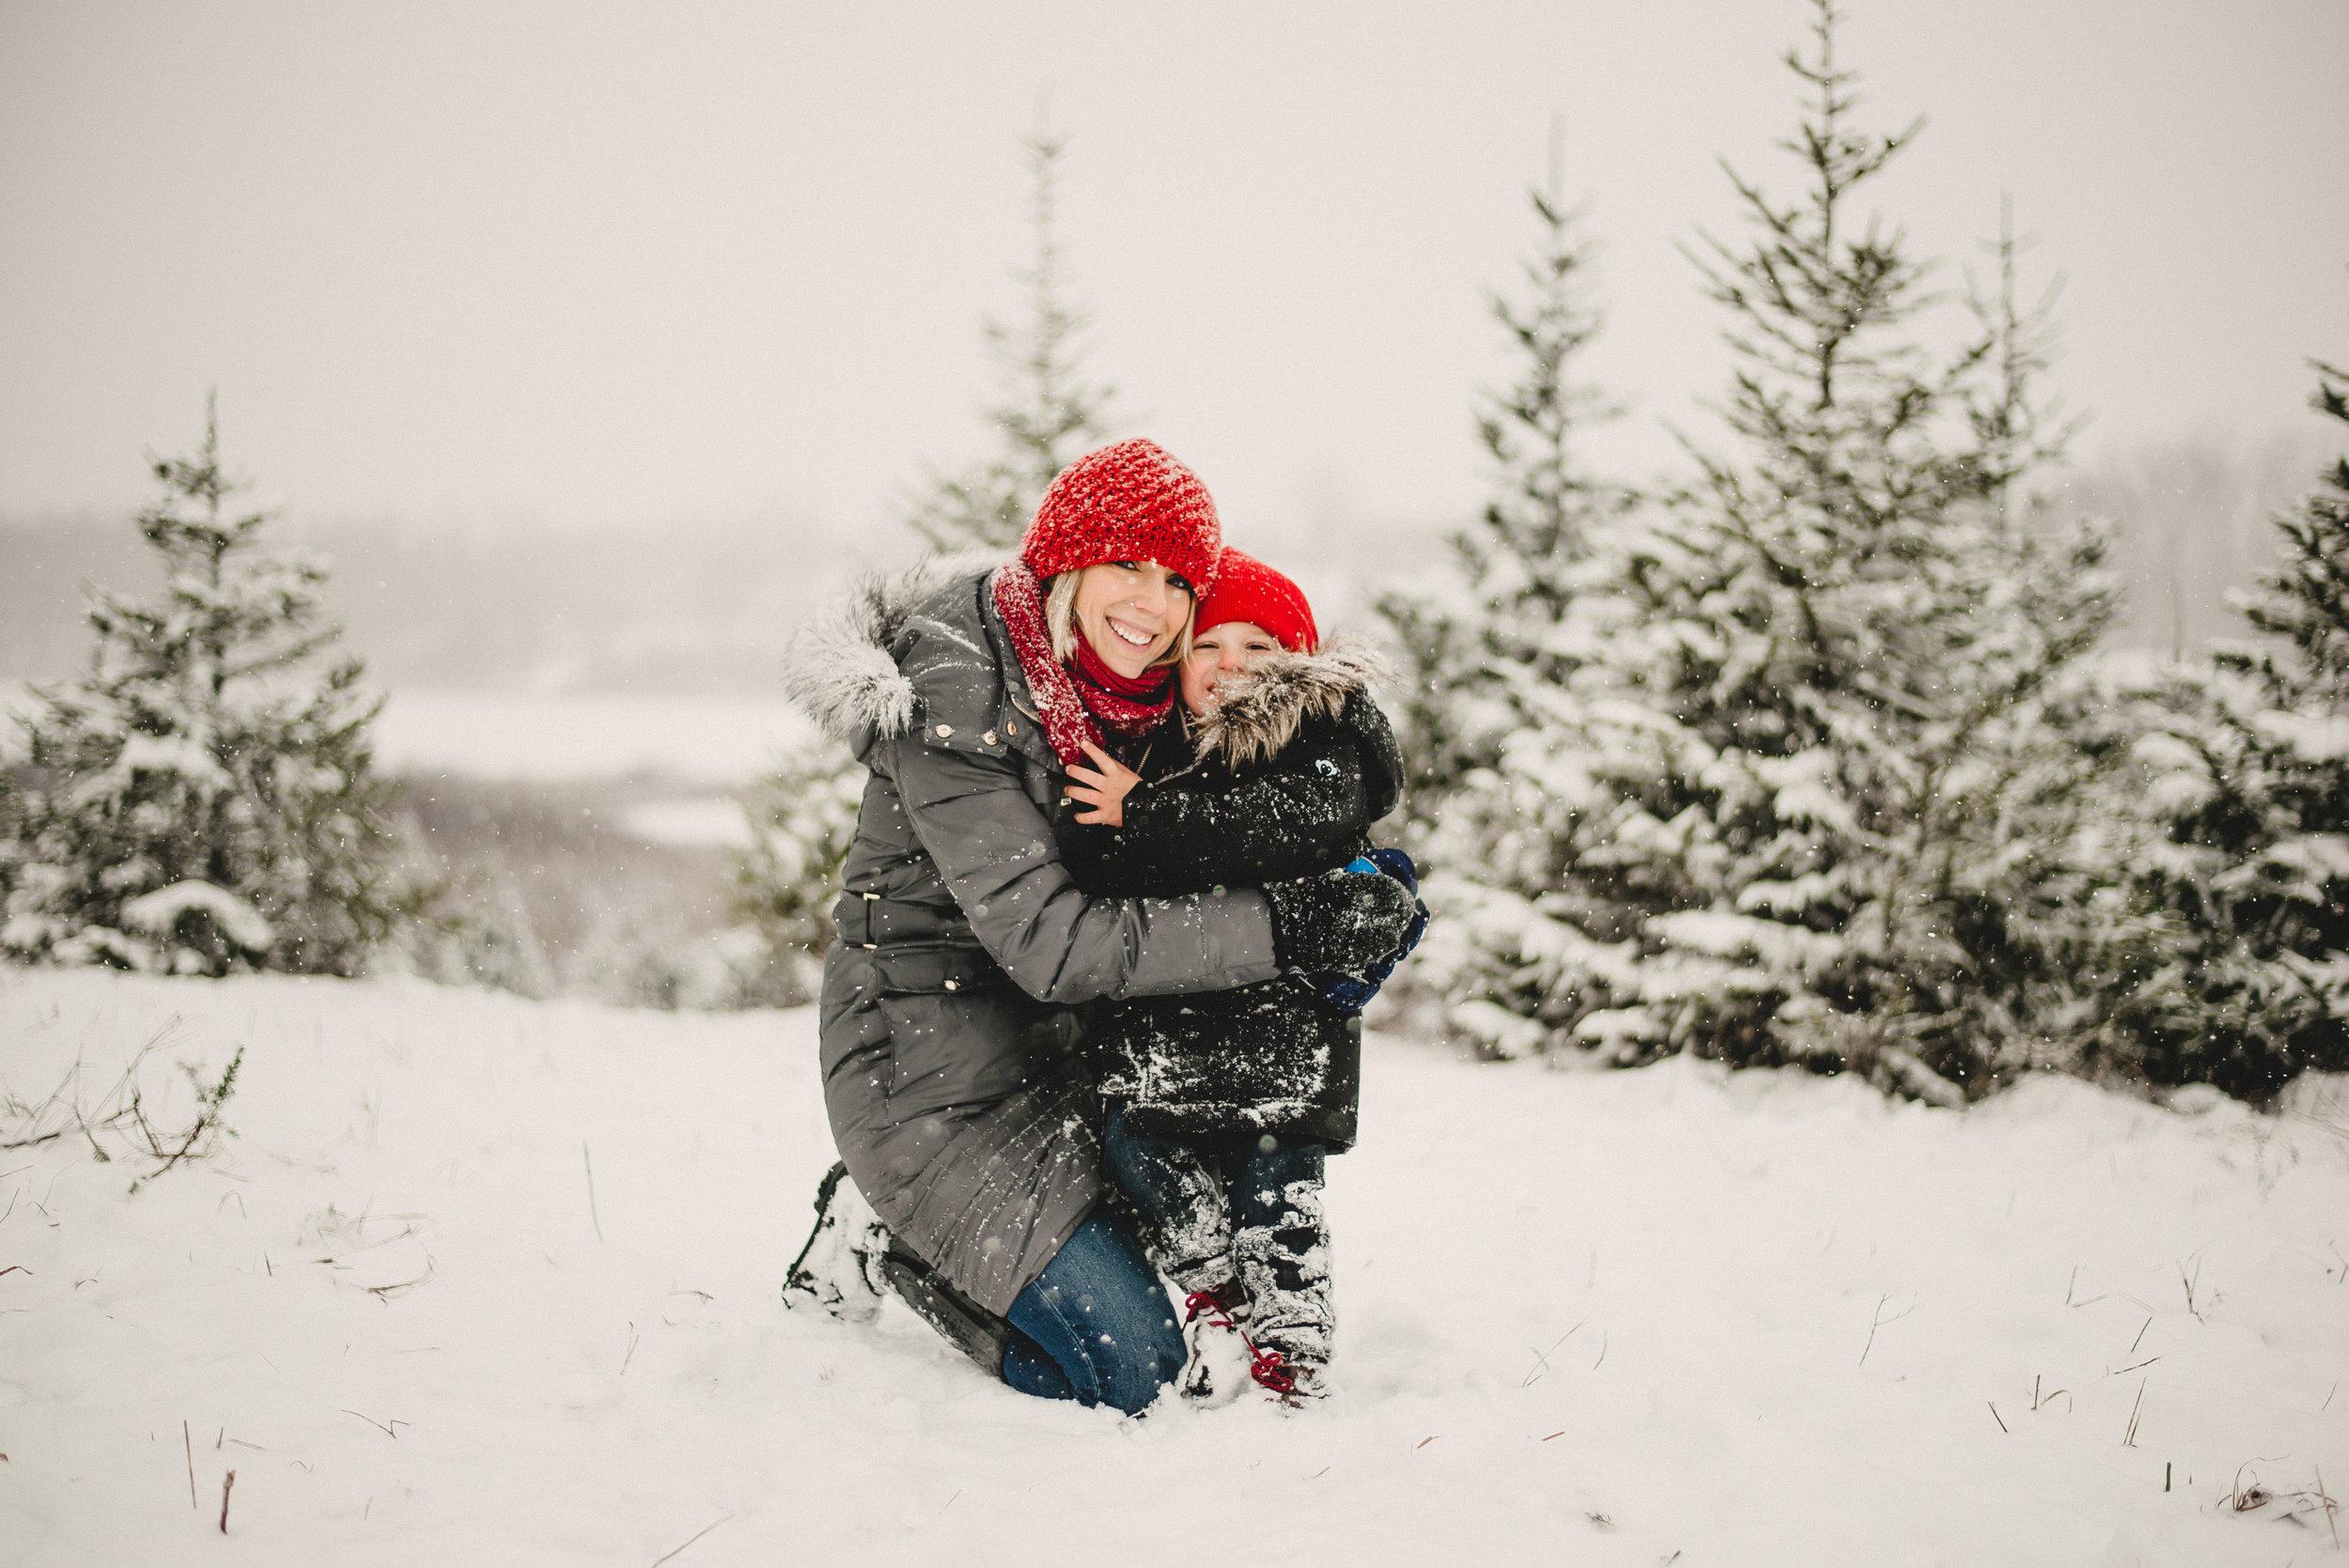 Christmas Tree Farm Family Photo Session Metamora Michigan Winter (35).JPG